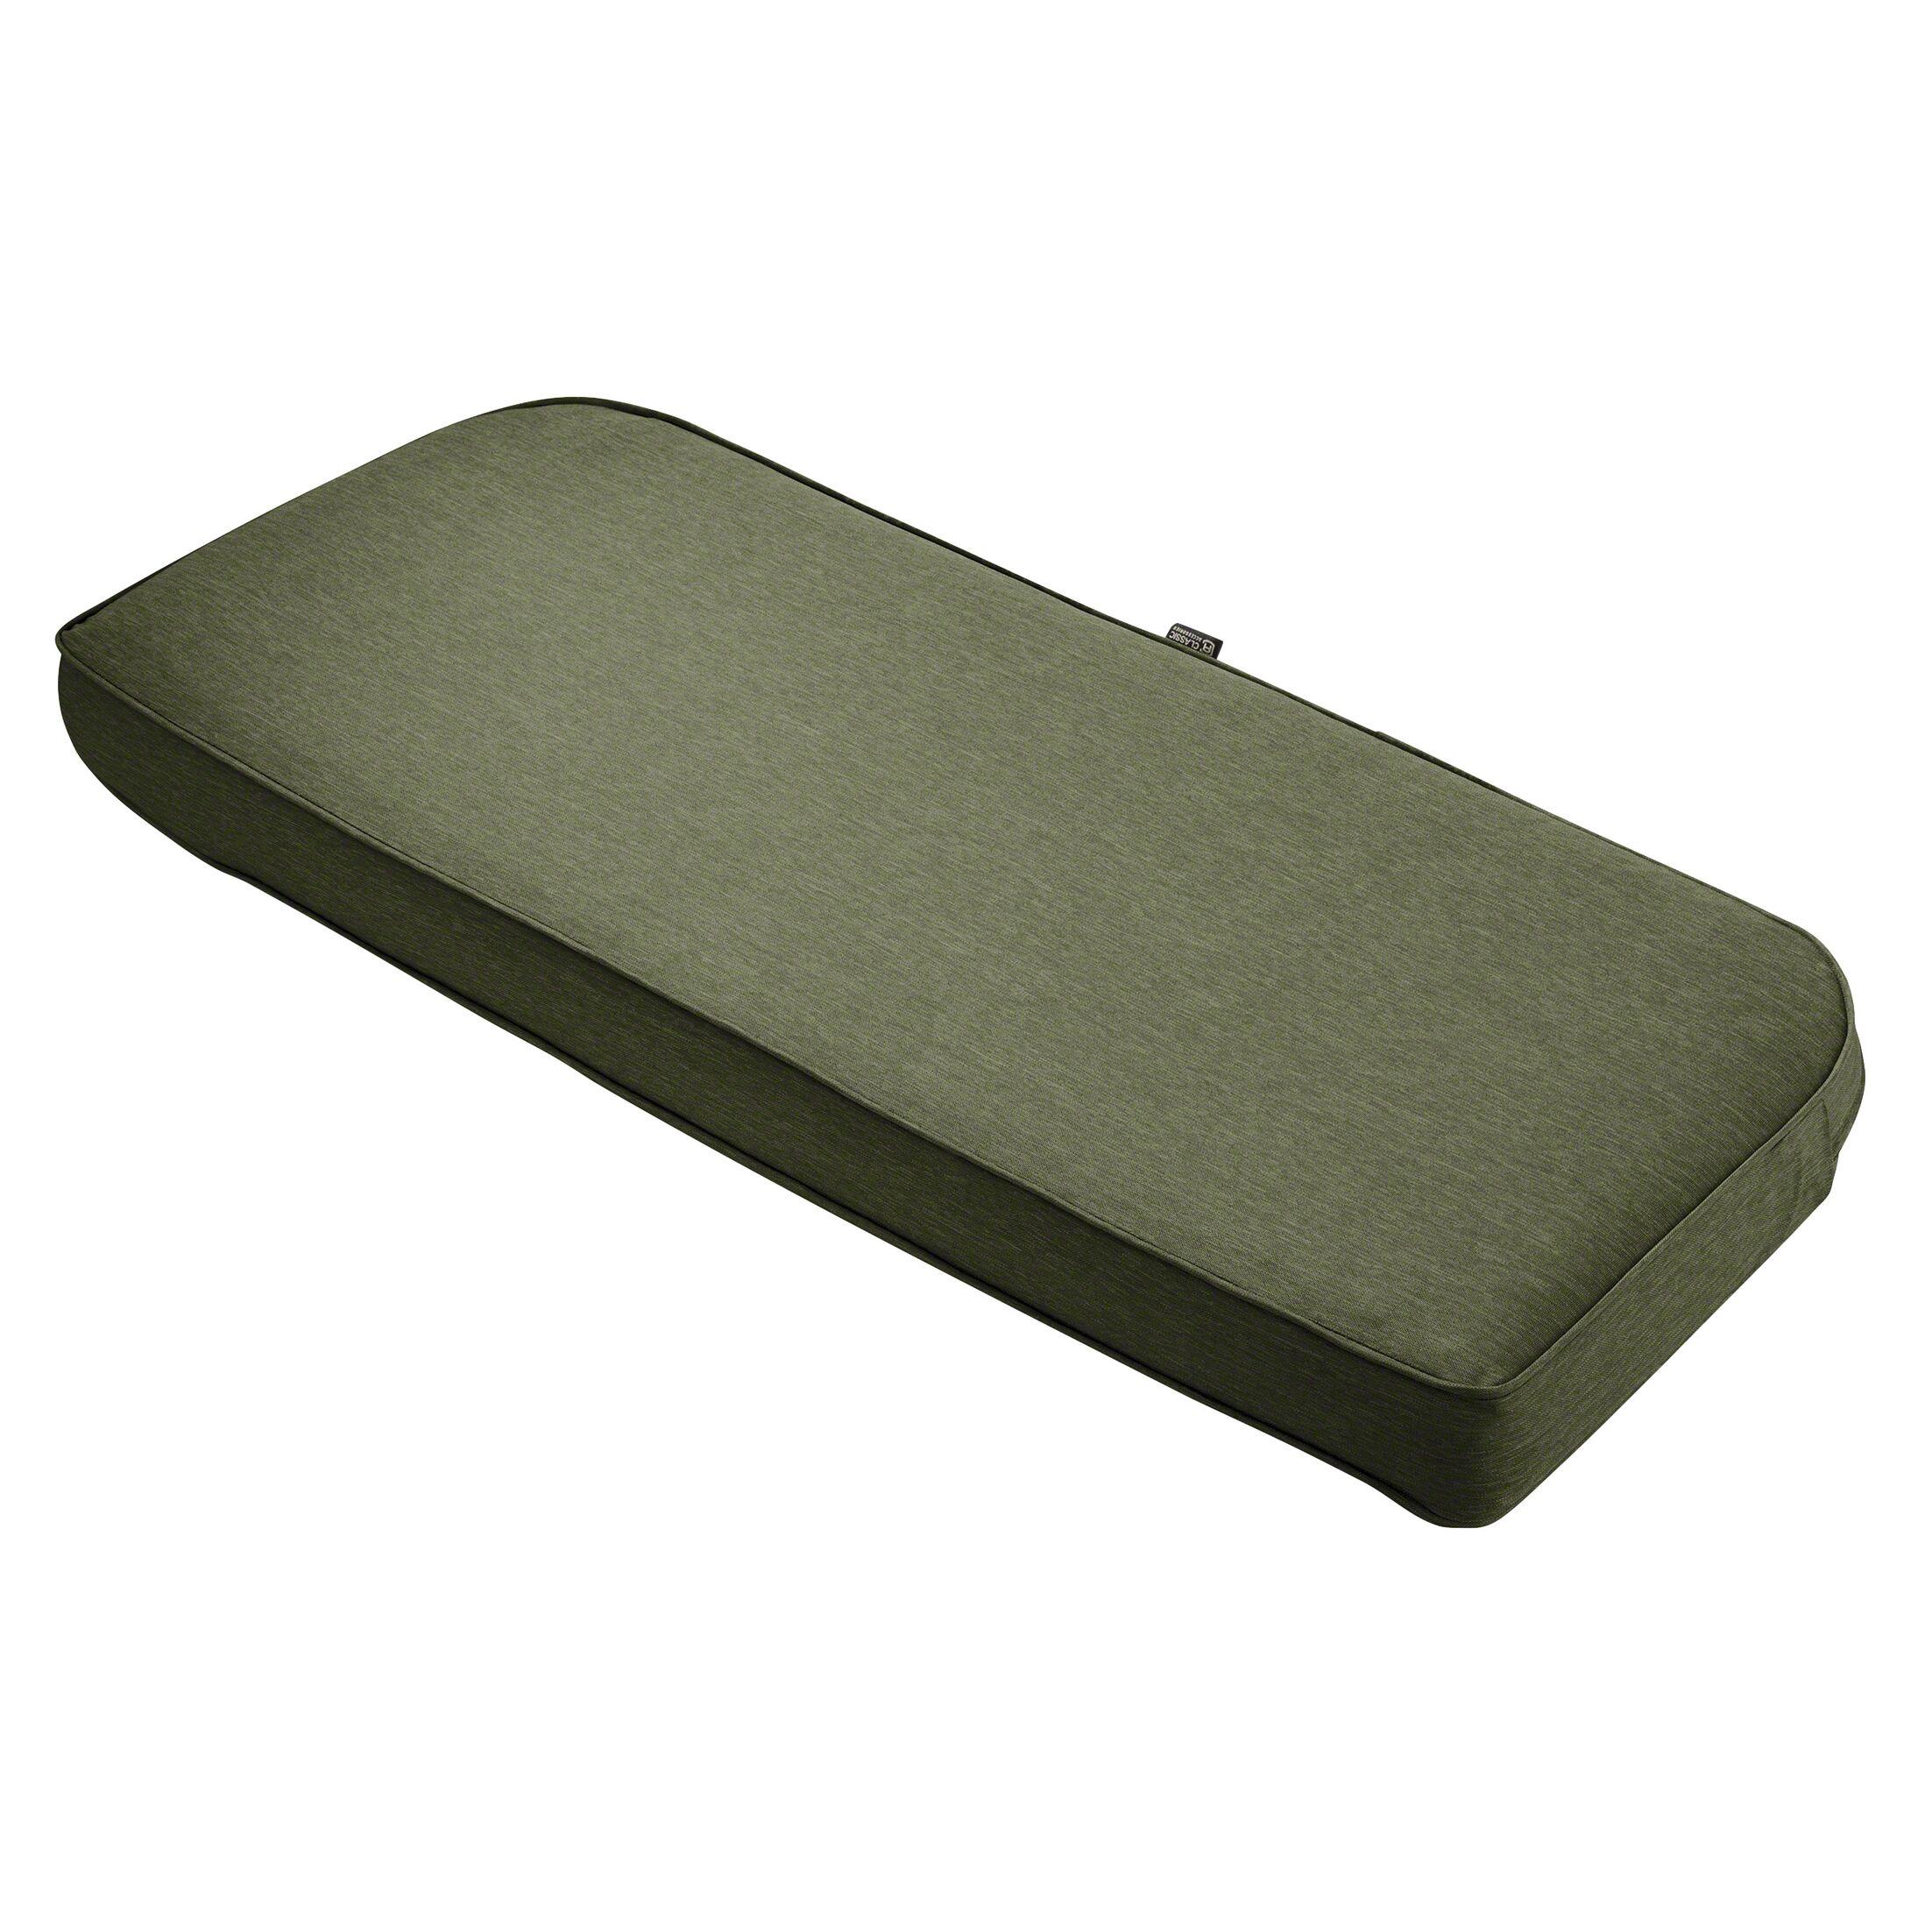 Gunn FadeSafe? Outdoor Bench Cushion Fabric: Heather Fern Green